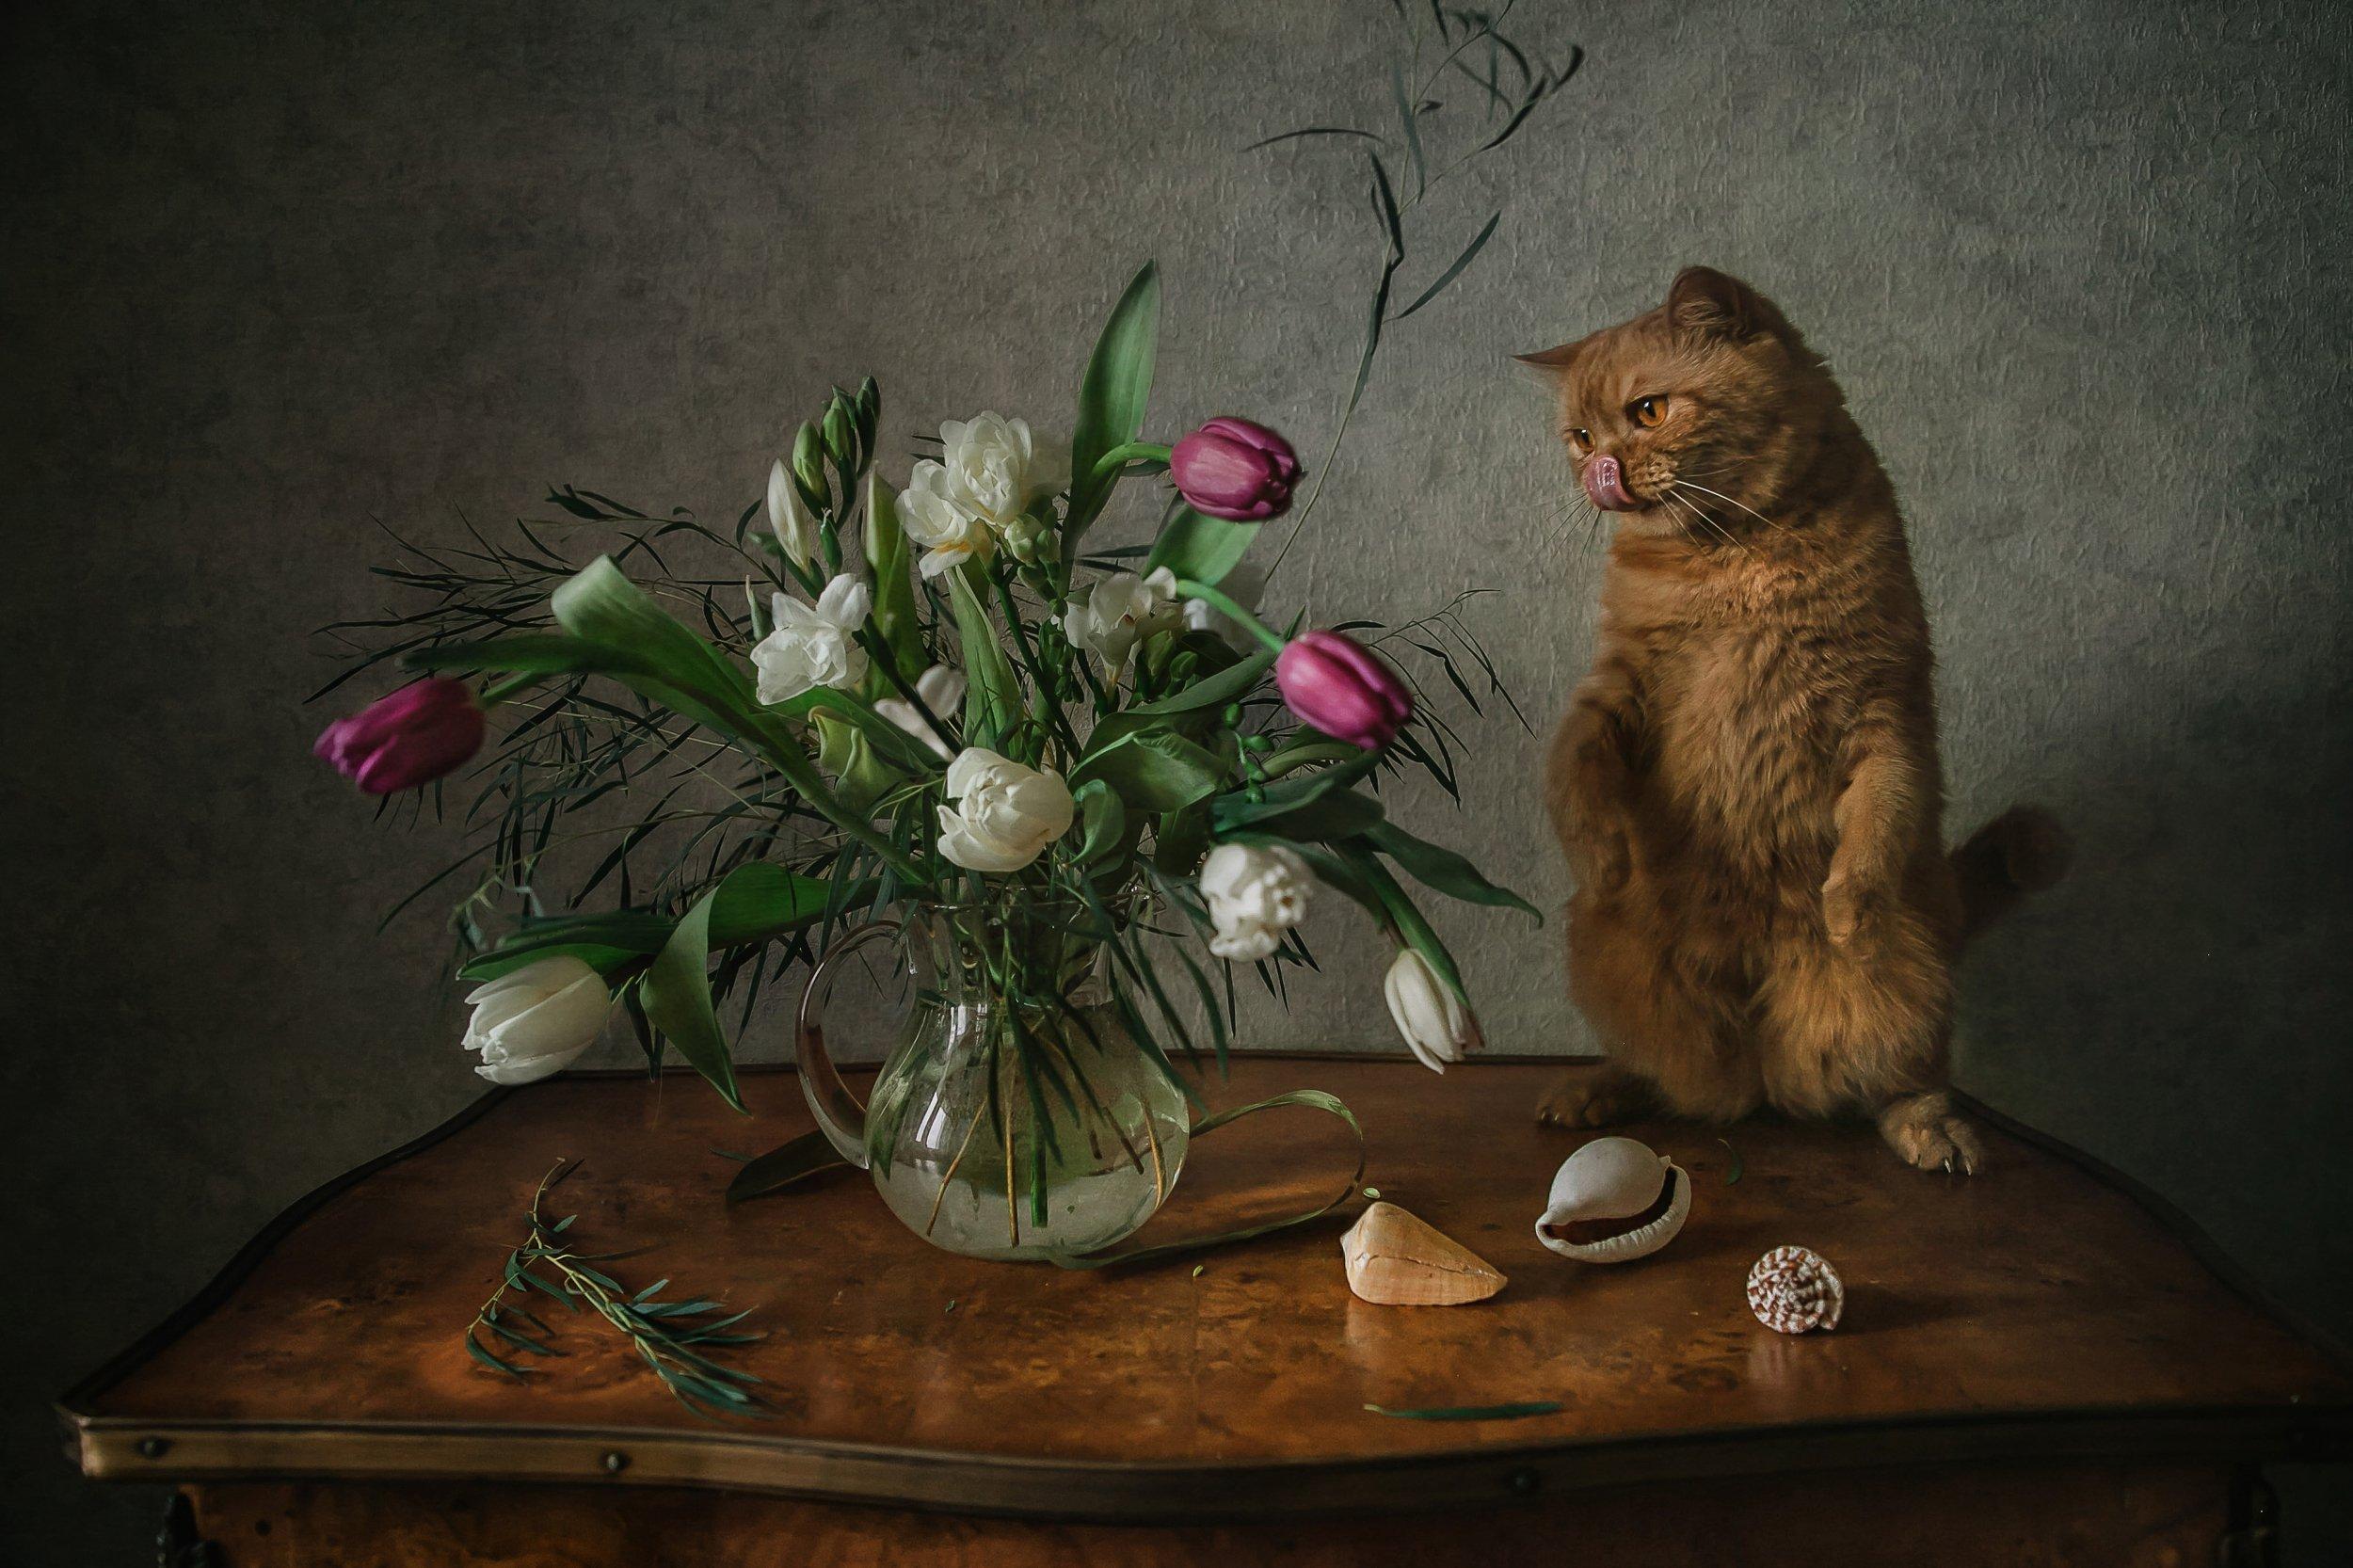 натюрморт, кот, цветы, ракушки, Анна Петина